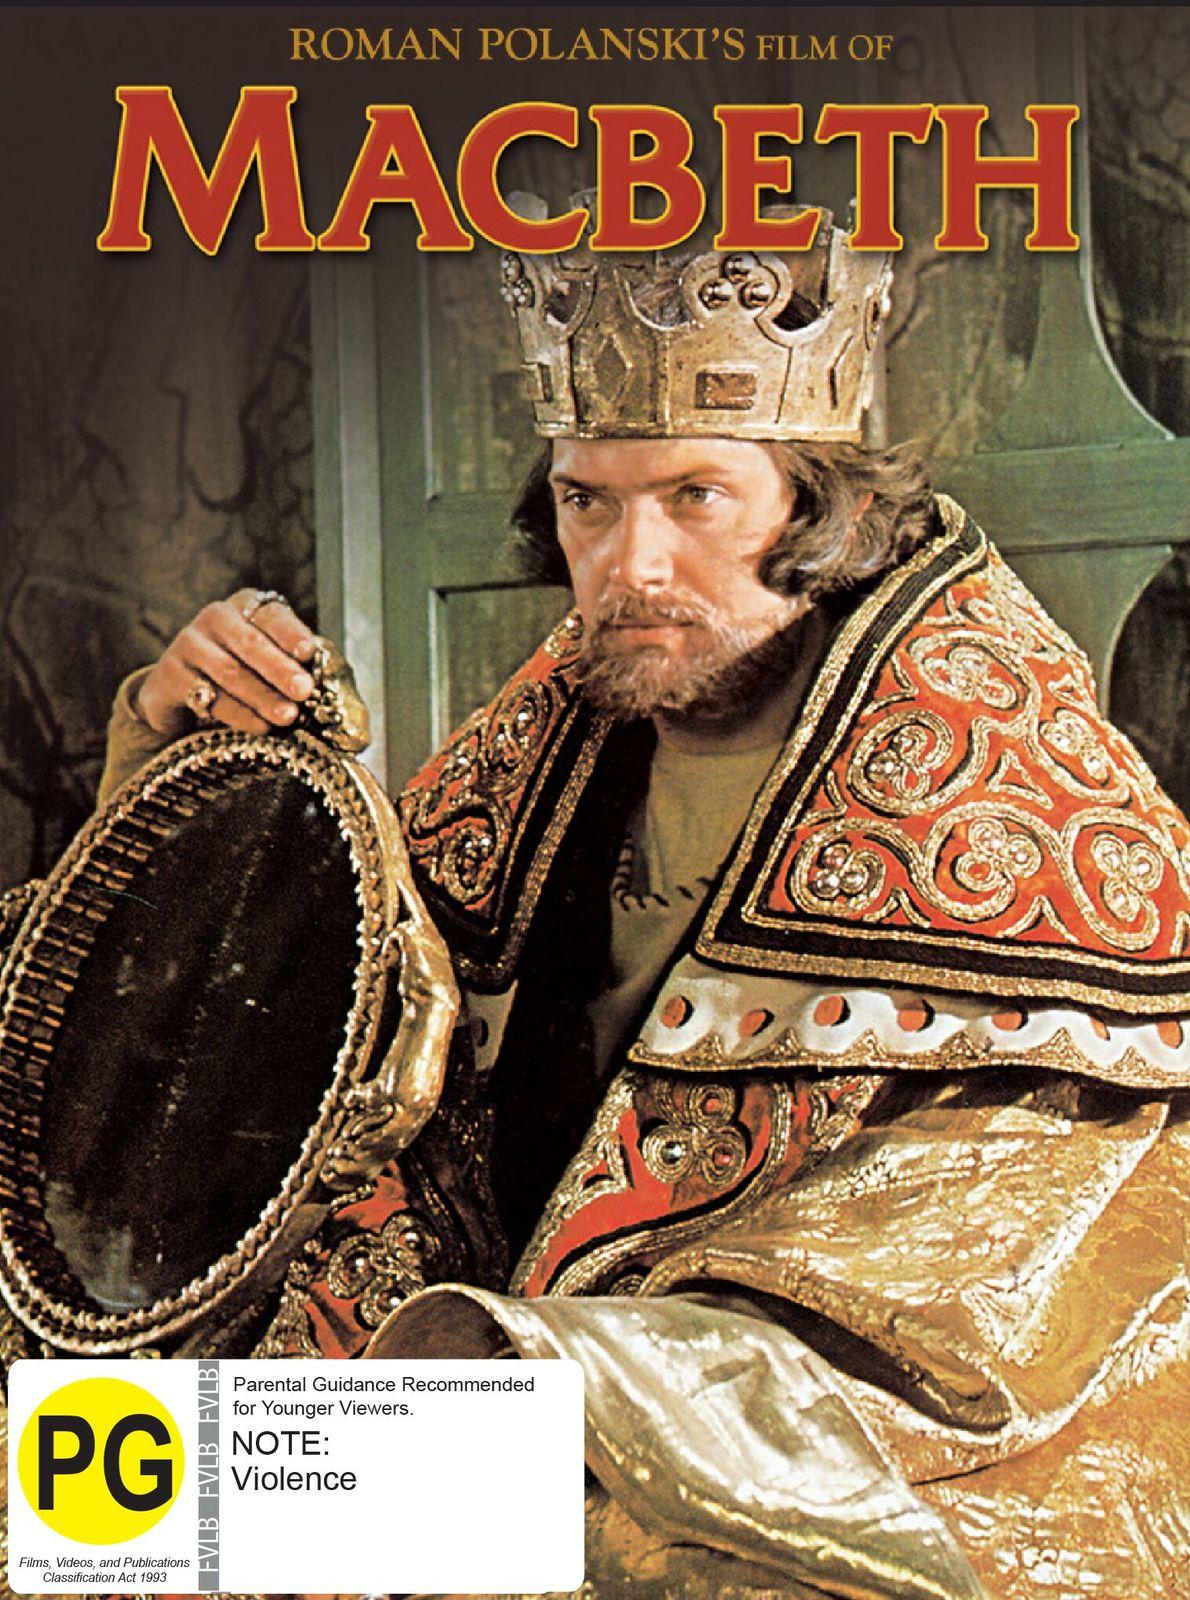 Macbeth image